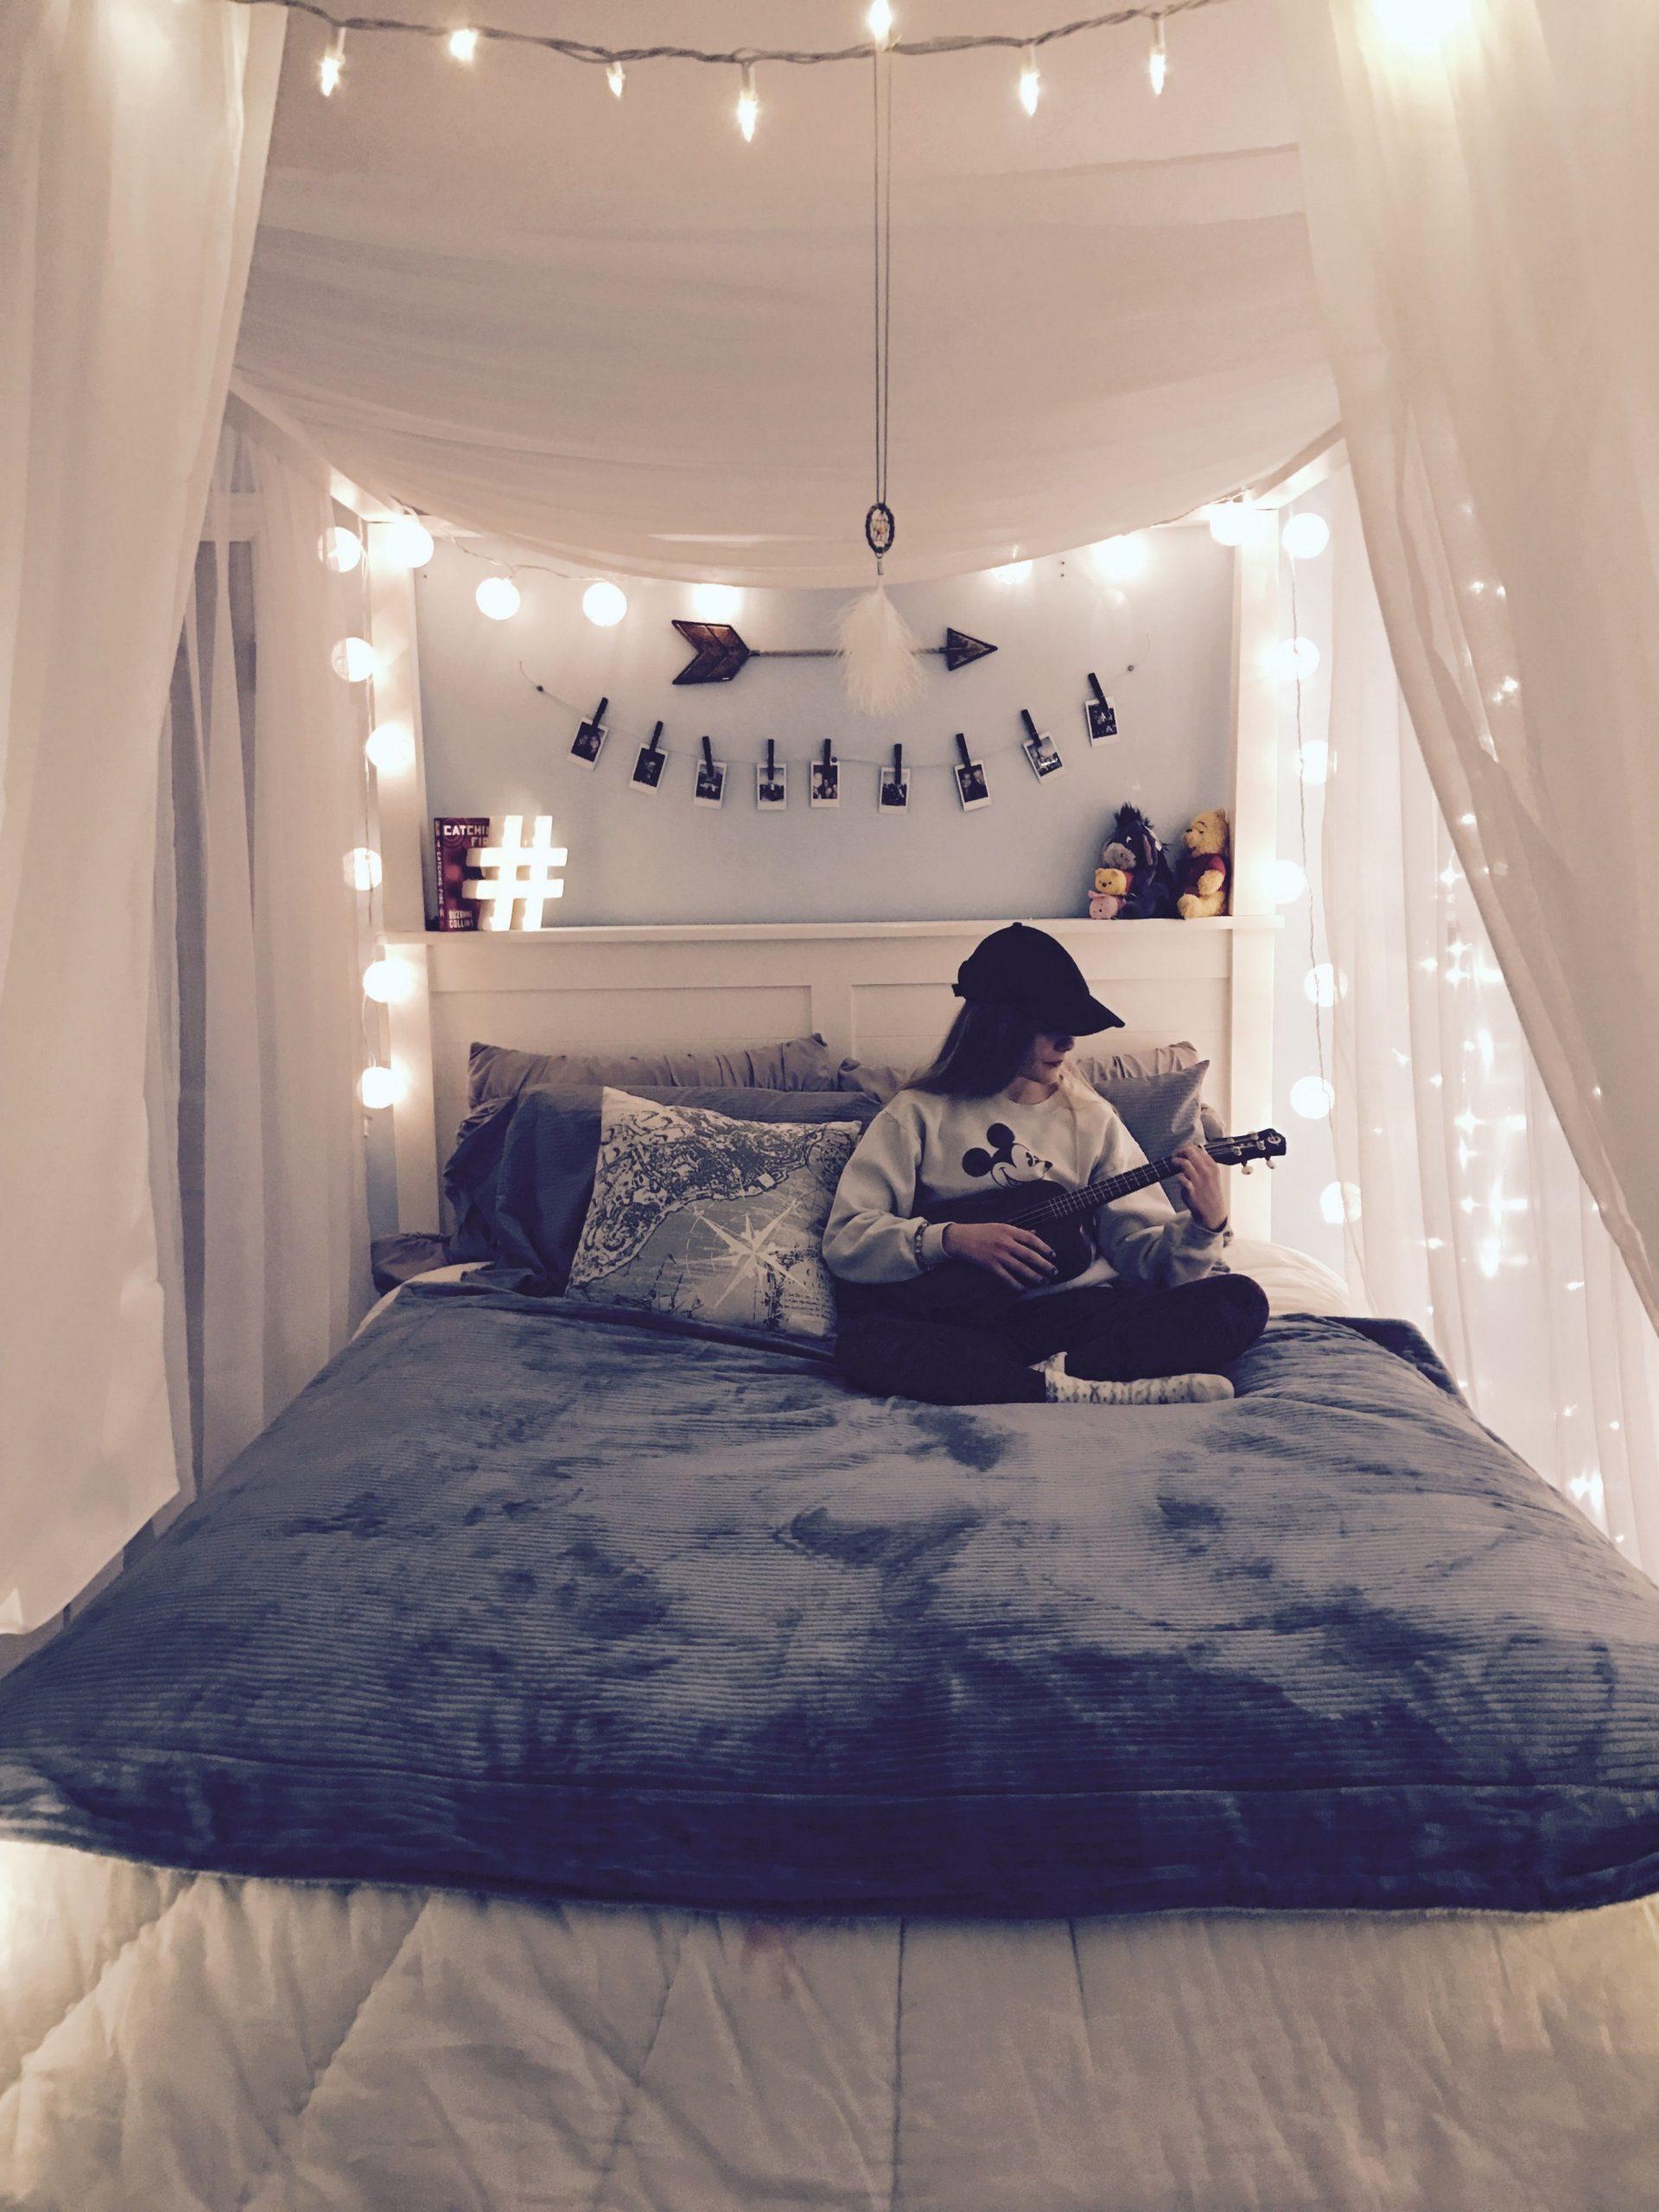 Pin on Teen Bedrooms - Bedroom Ideas For Teens